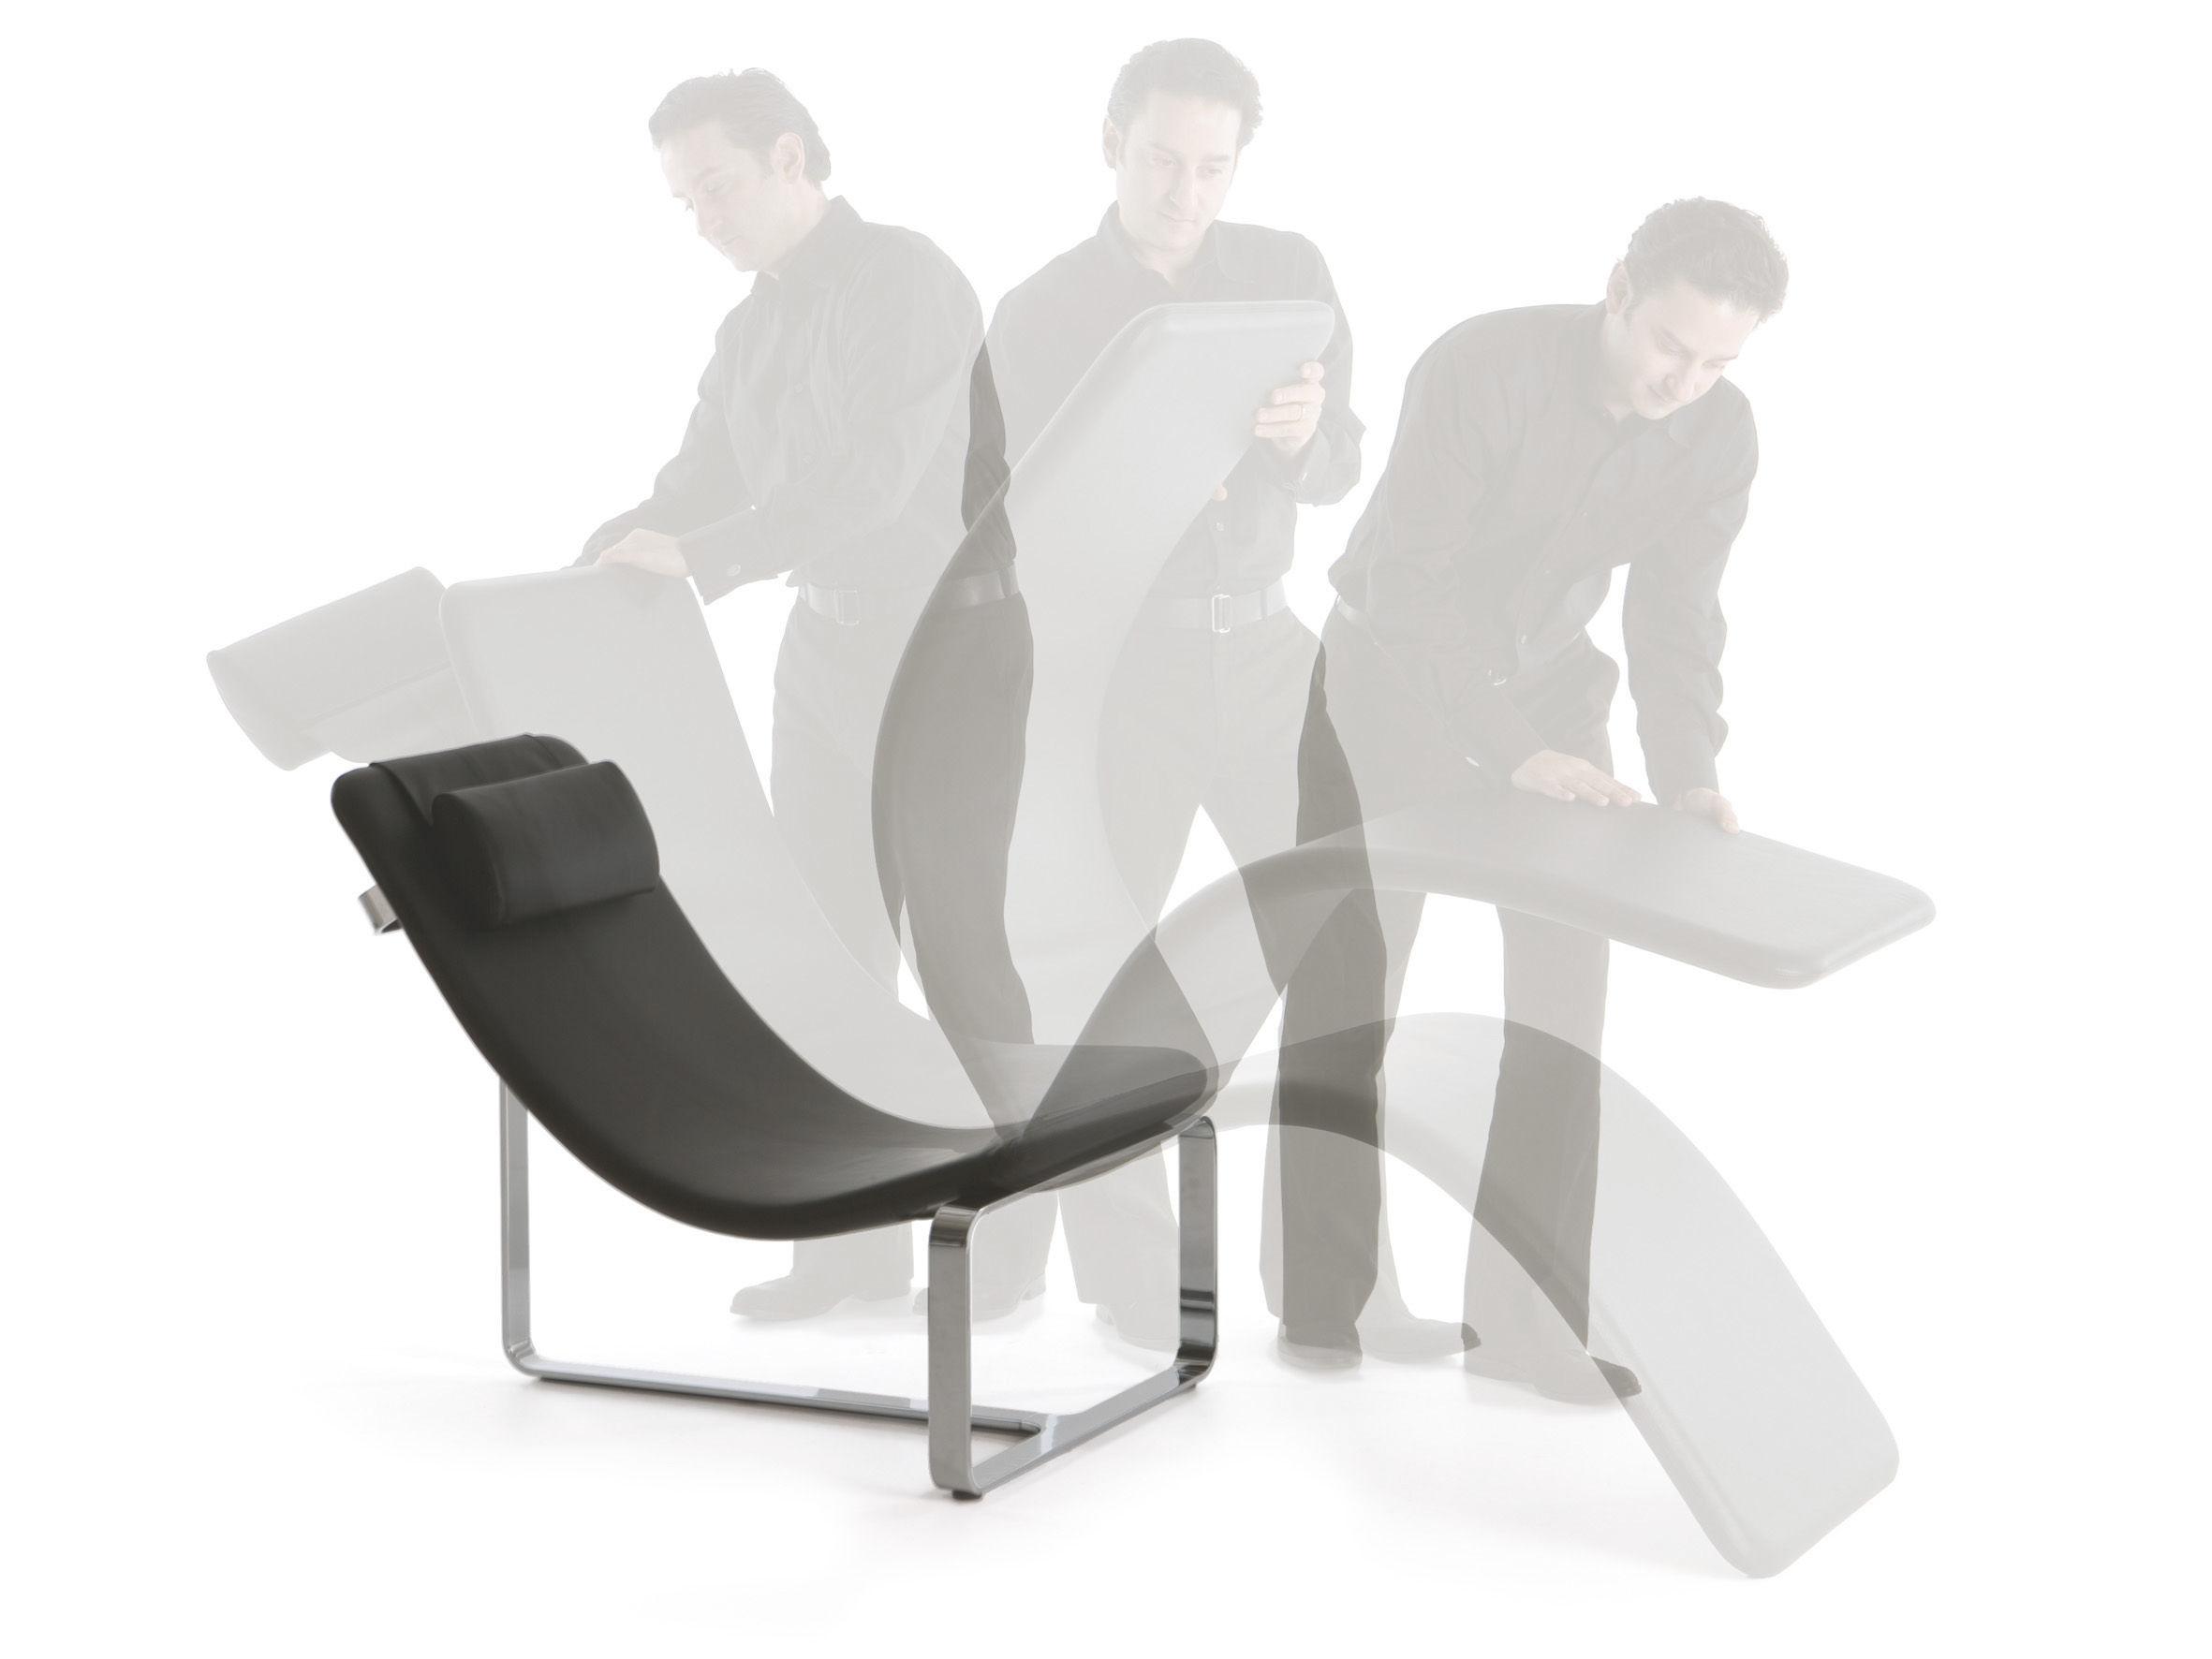 fauteuil flipt convertible en lit de jour cuir noir cerruti baleri made in design. Black Bedroom Furniture Sets. Home Design Ideas